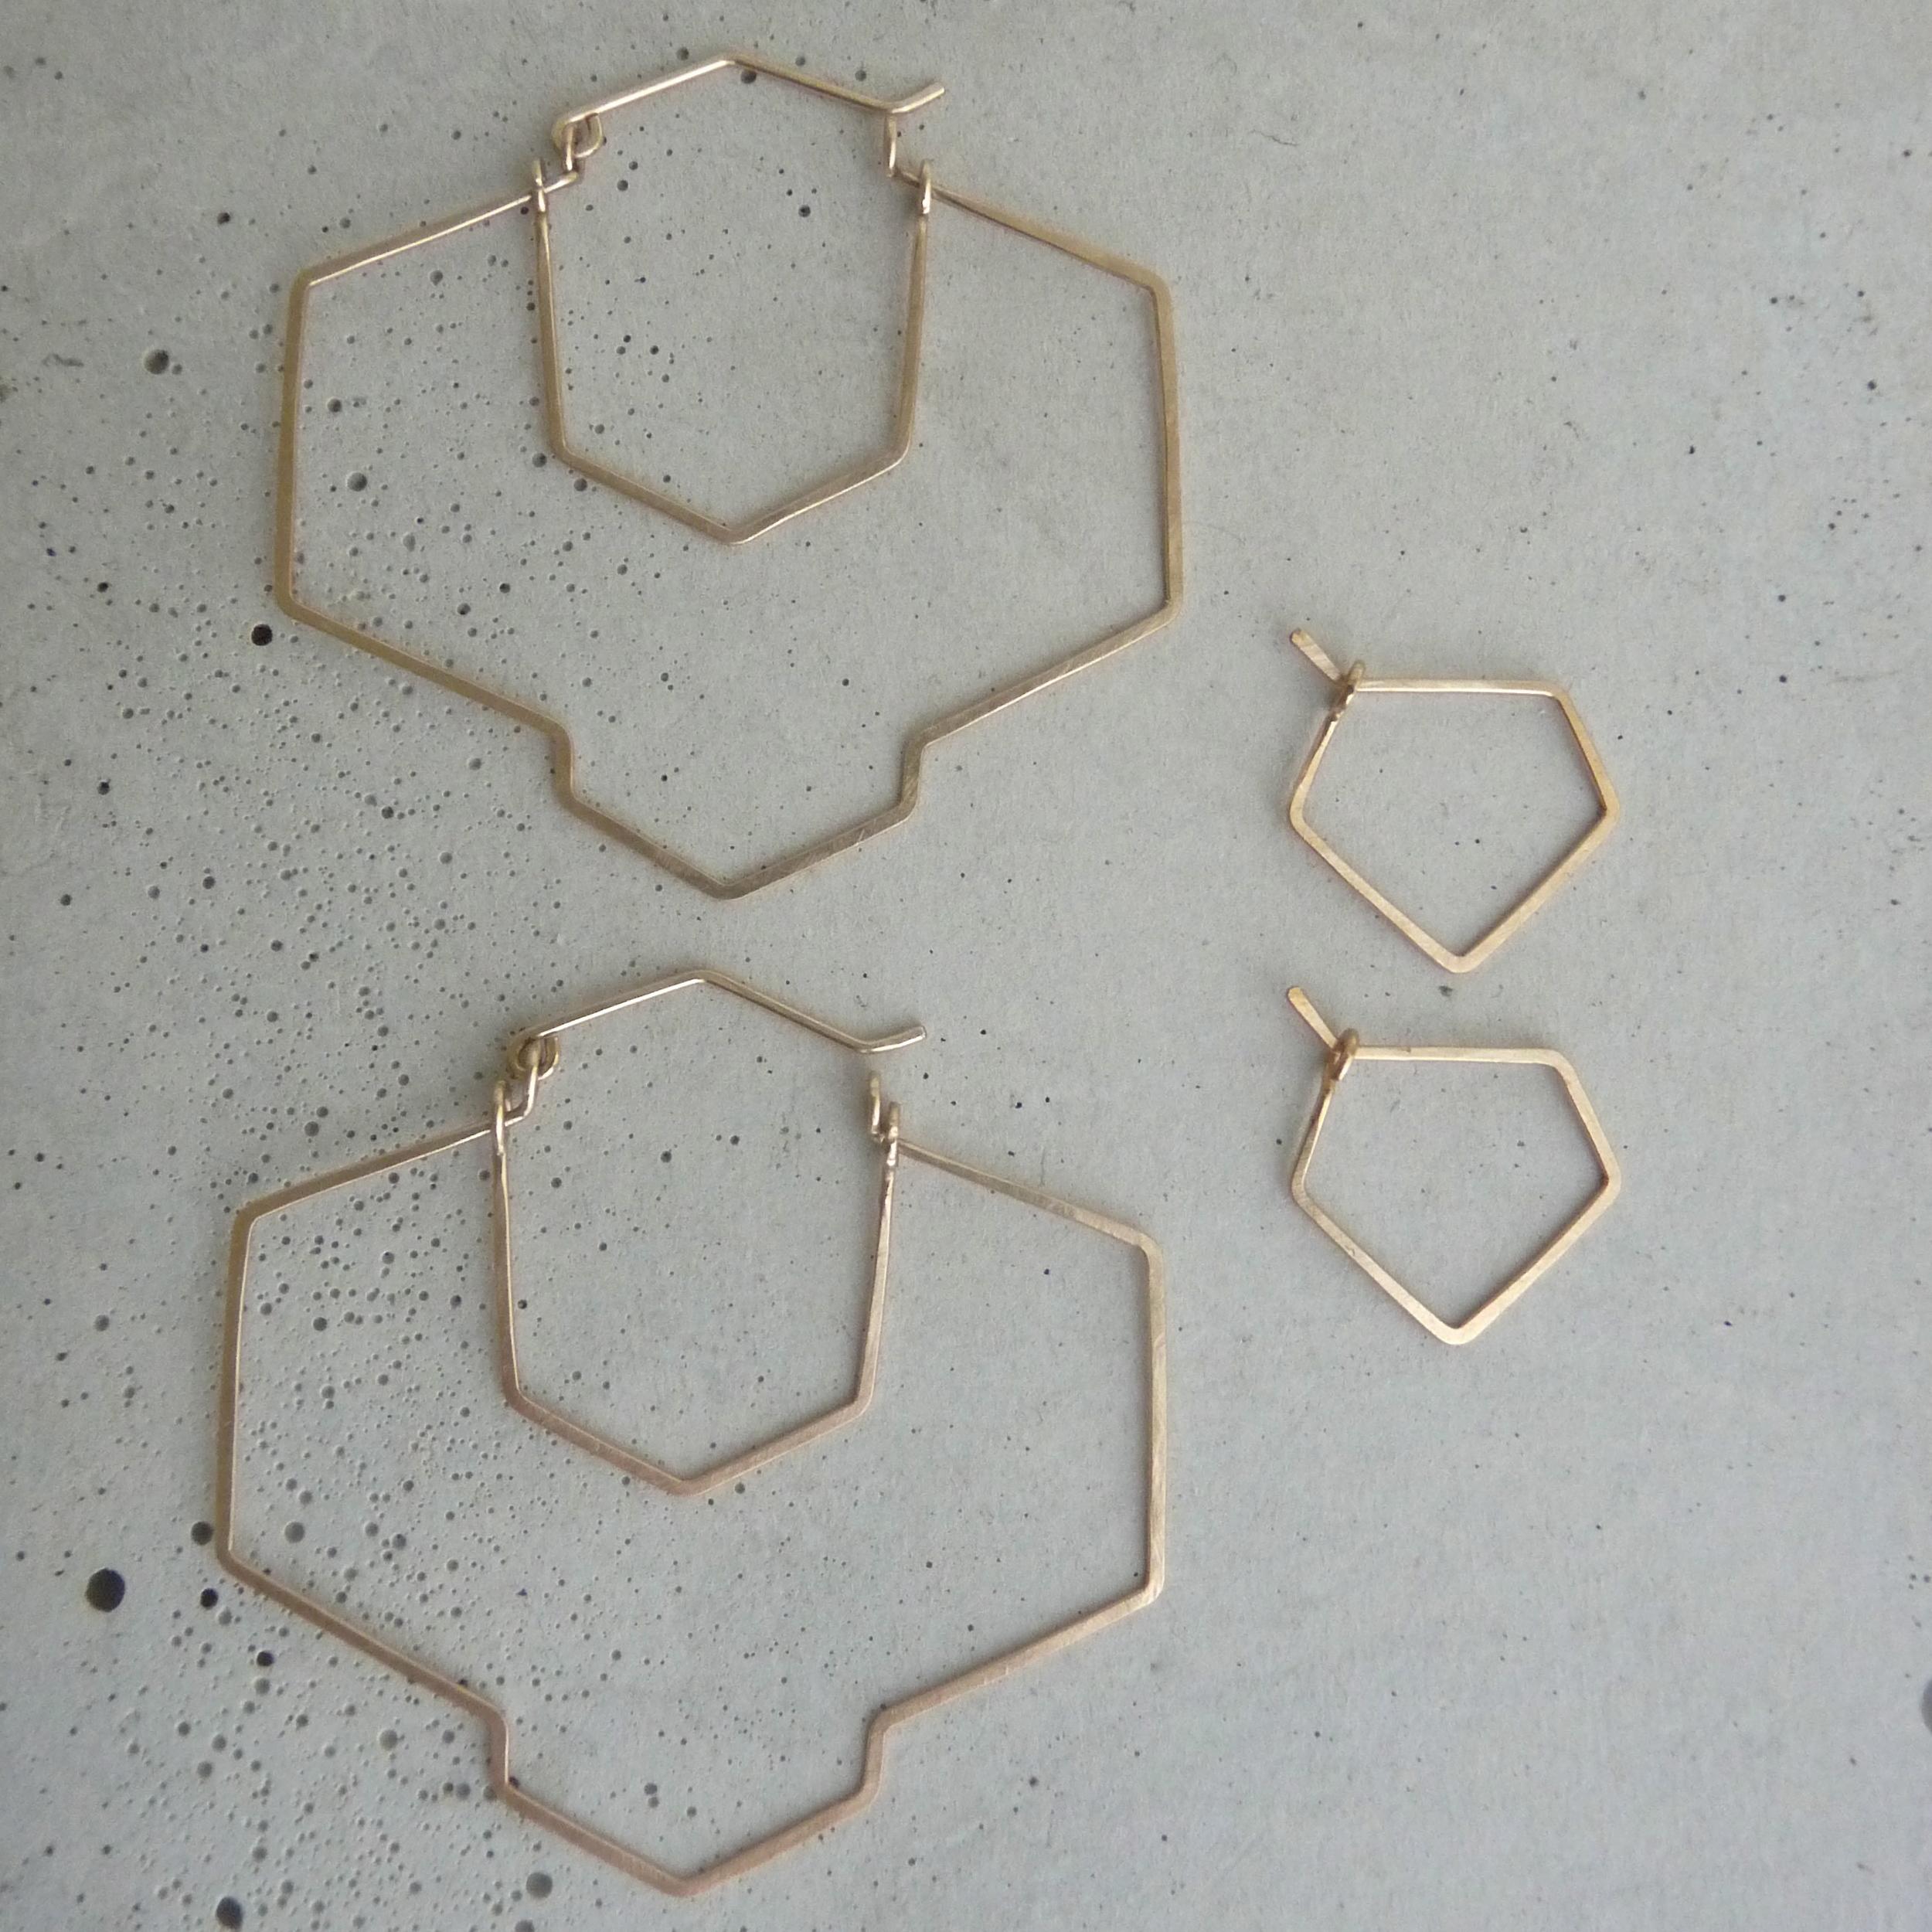 New Refined Basics, geometric hoop earrings, large gold hoops, big gold hoops, hammered hoop earrings, 2014 shifting seasons